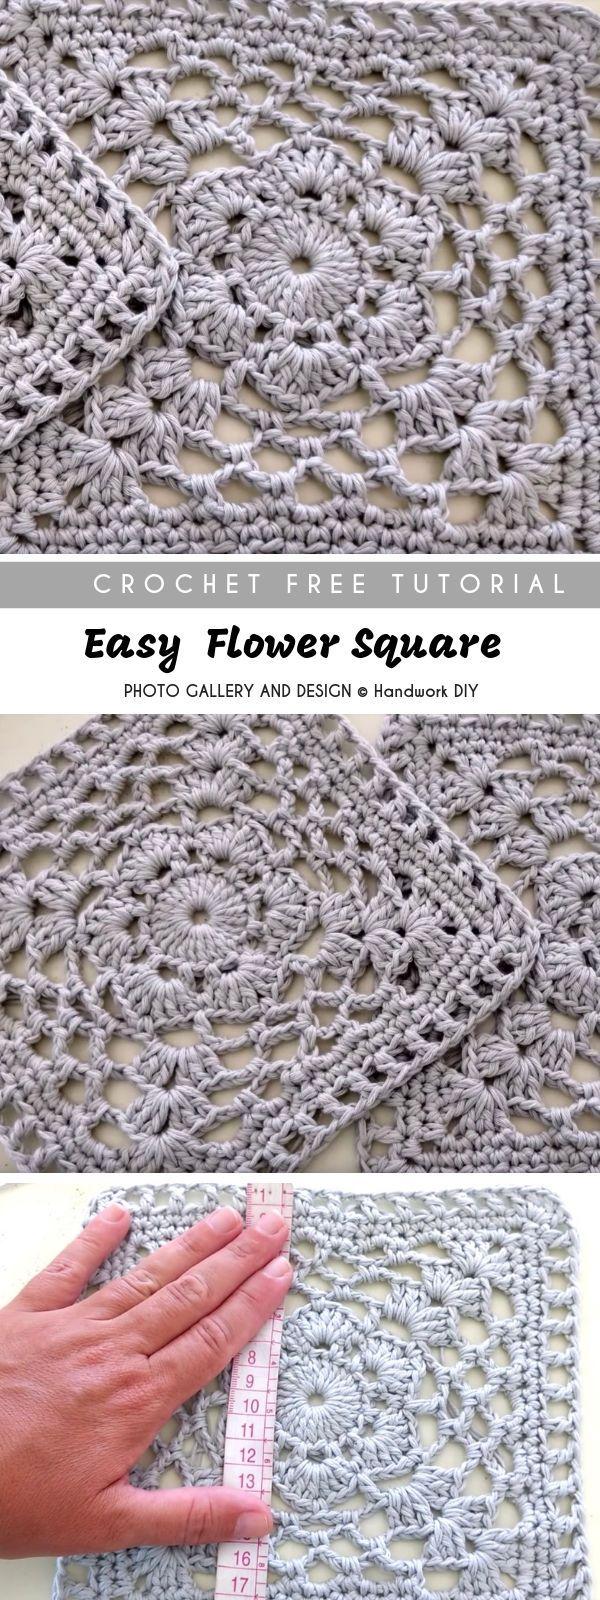 Easy Flower Crochet Square with Free TutorialPattern Center Crochet Knit